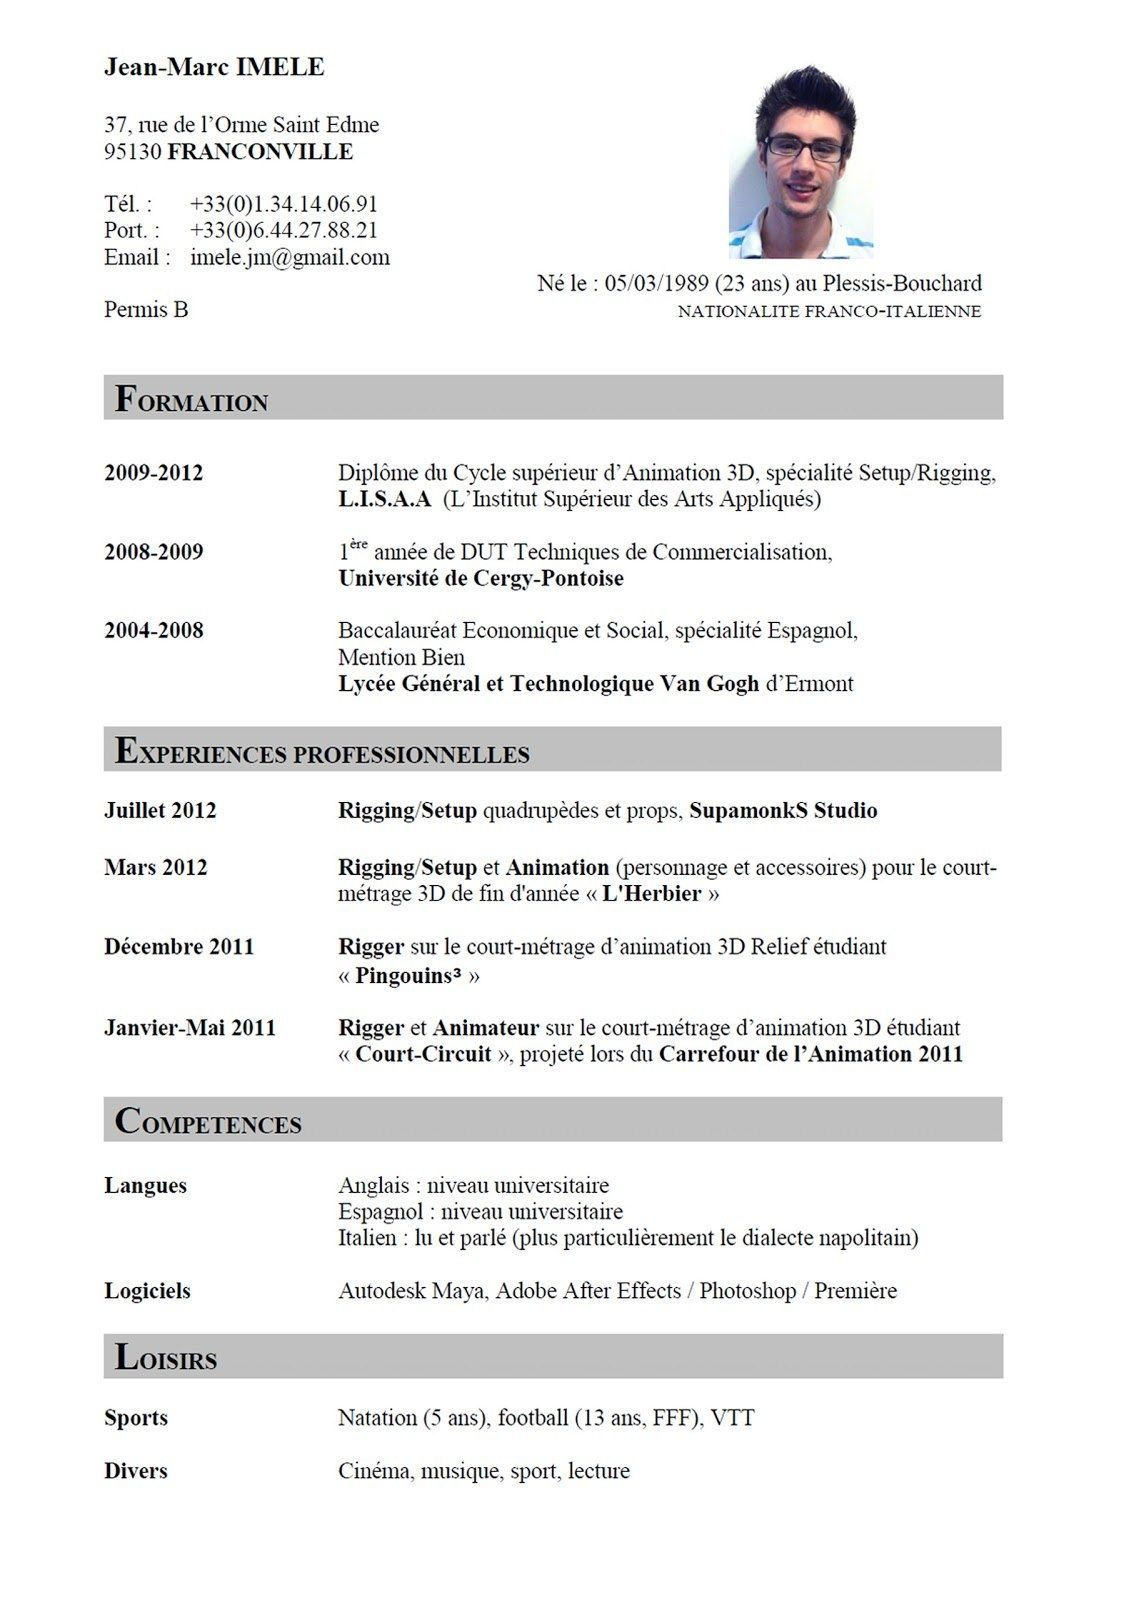 Francais Curriculum Vitae Template Ossaba Com Faire Cv En Anglais Sample Resume Format Resume Format Examples Best Resume Format